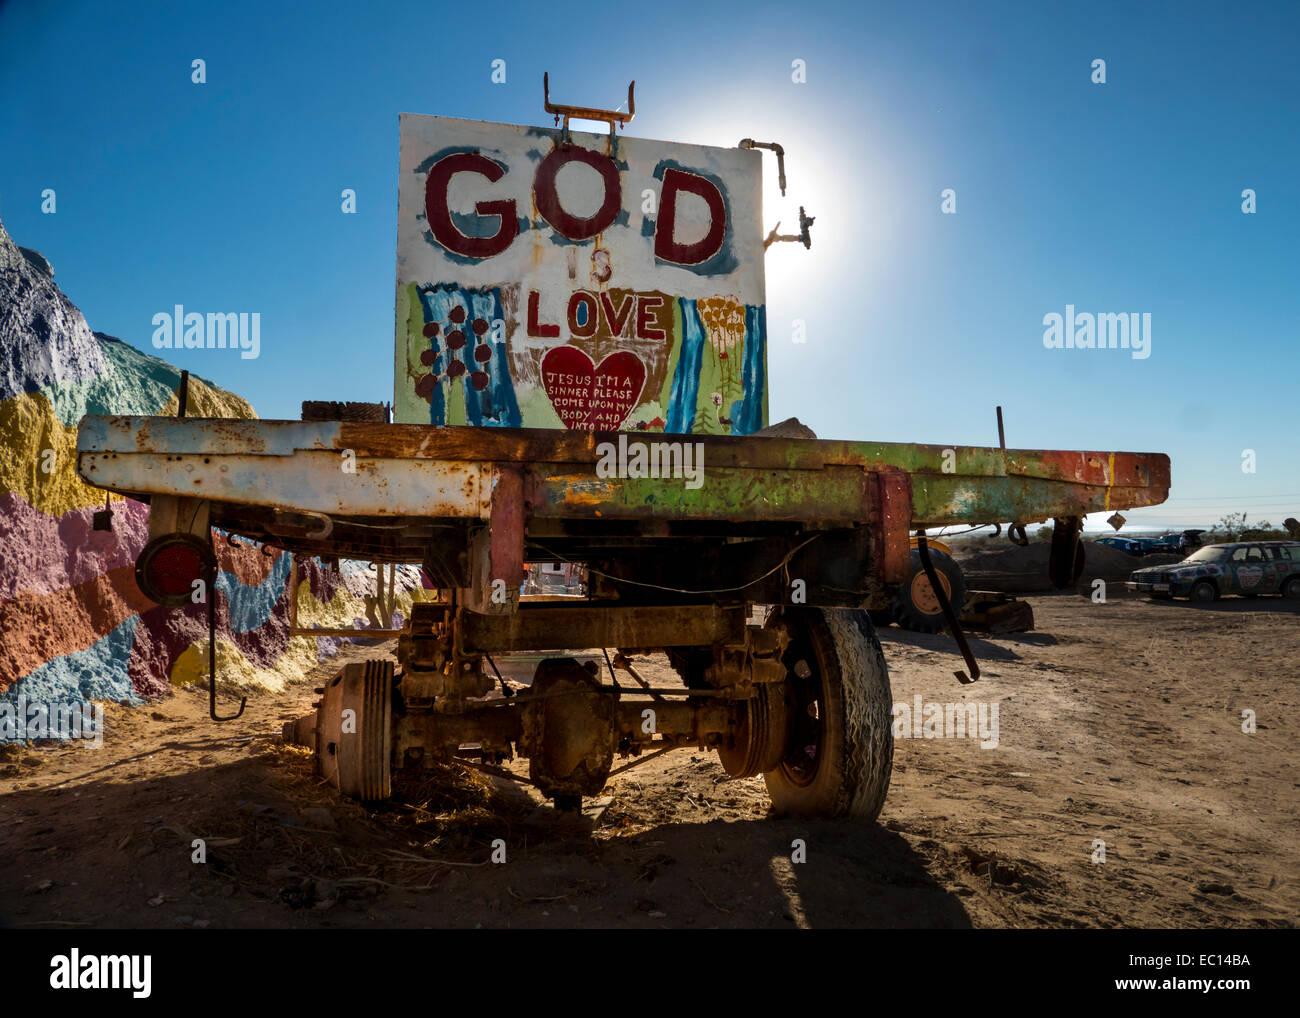 A religious folk art truck by Leonard Knight at Salvation Mountain near Niland California - Stock Image